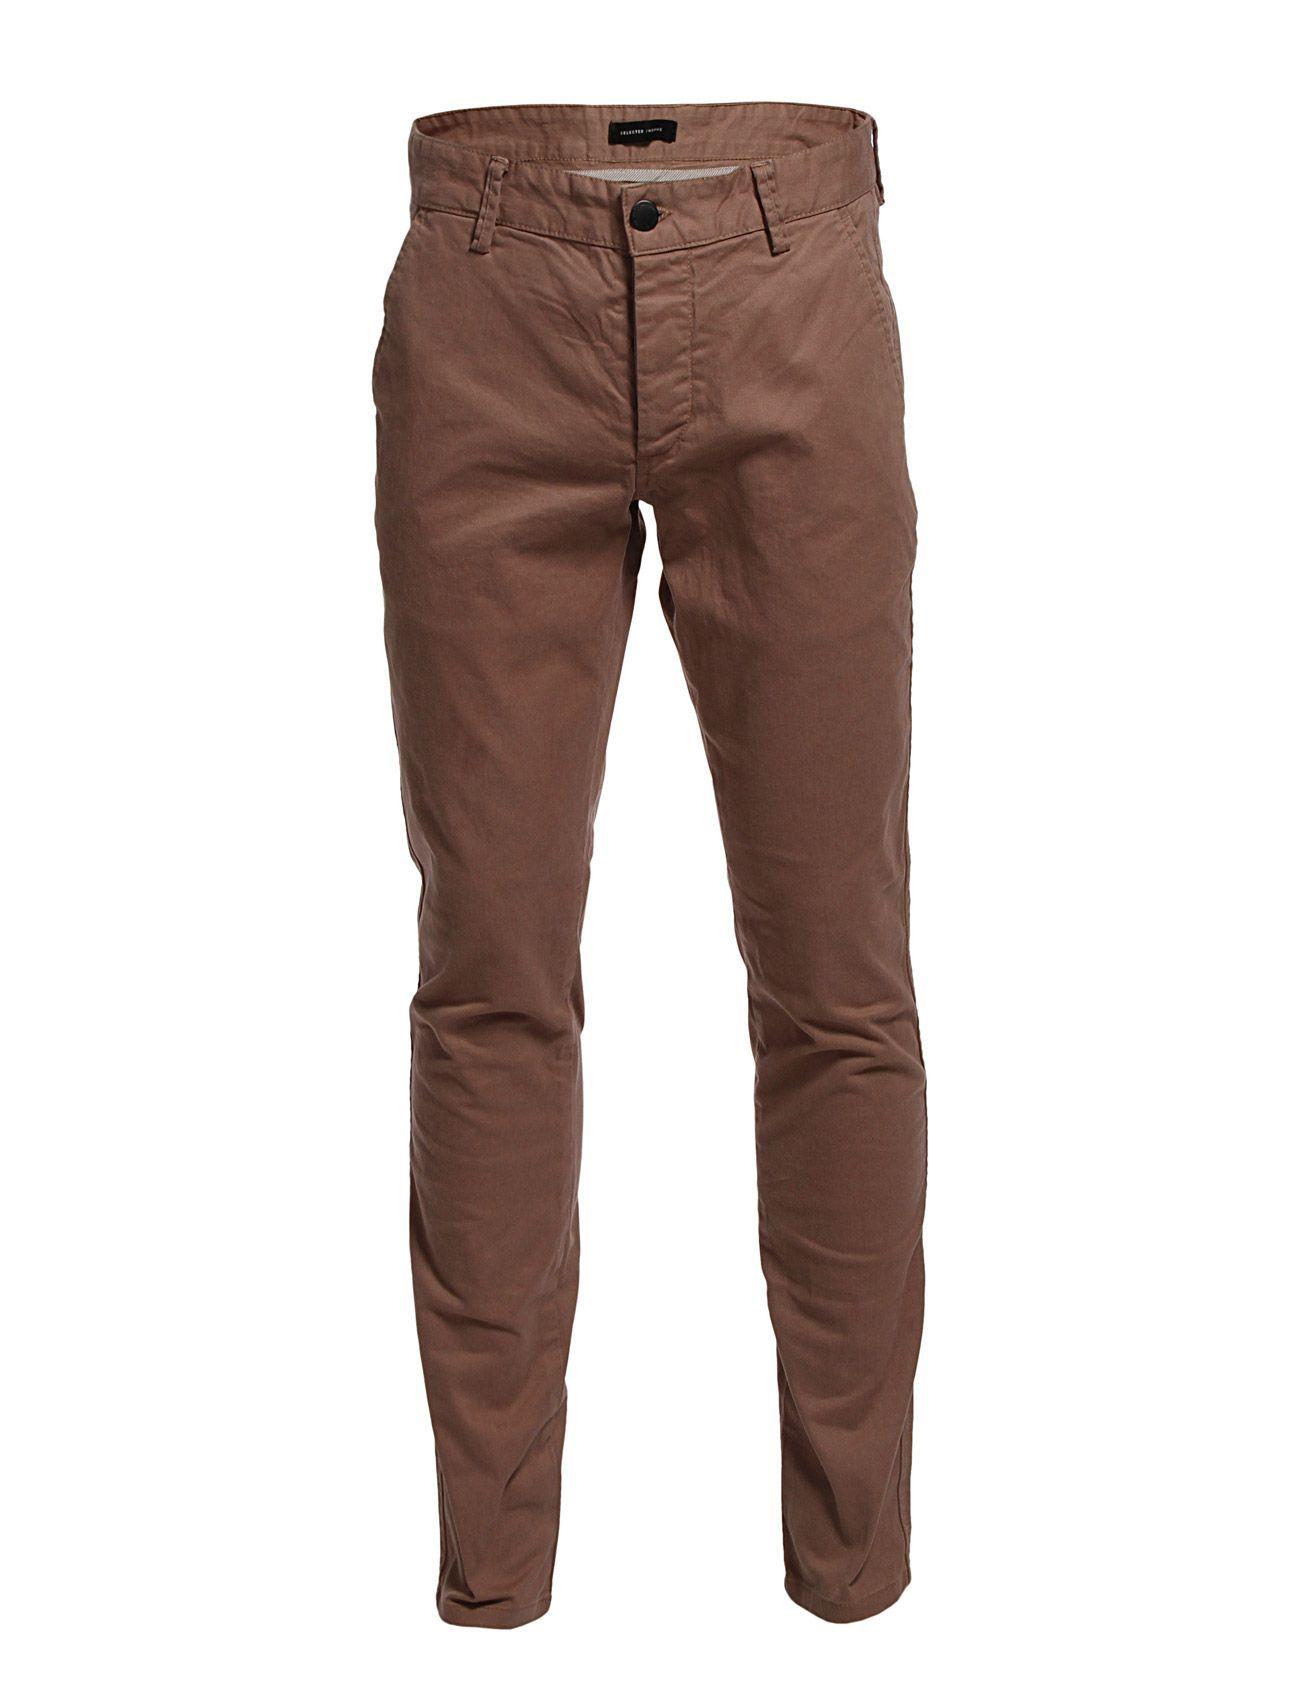 Luca Camel Chino Pants Noos T